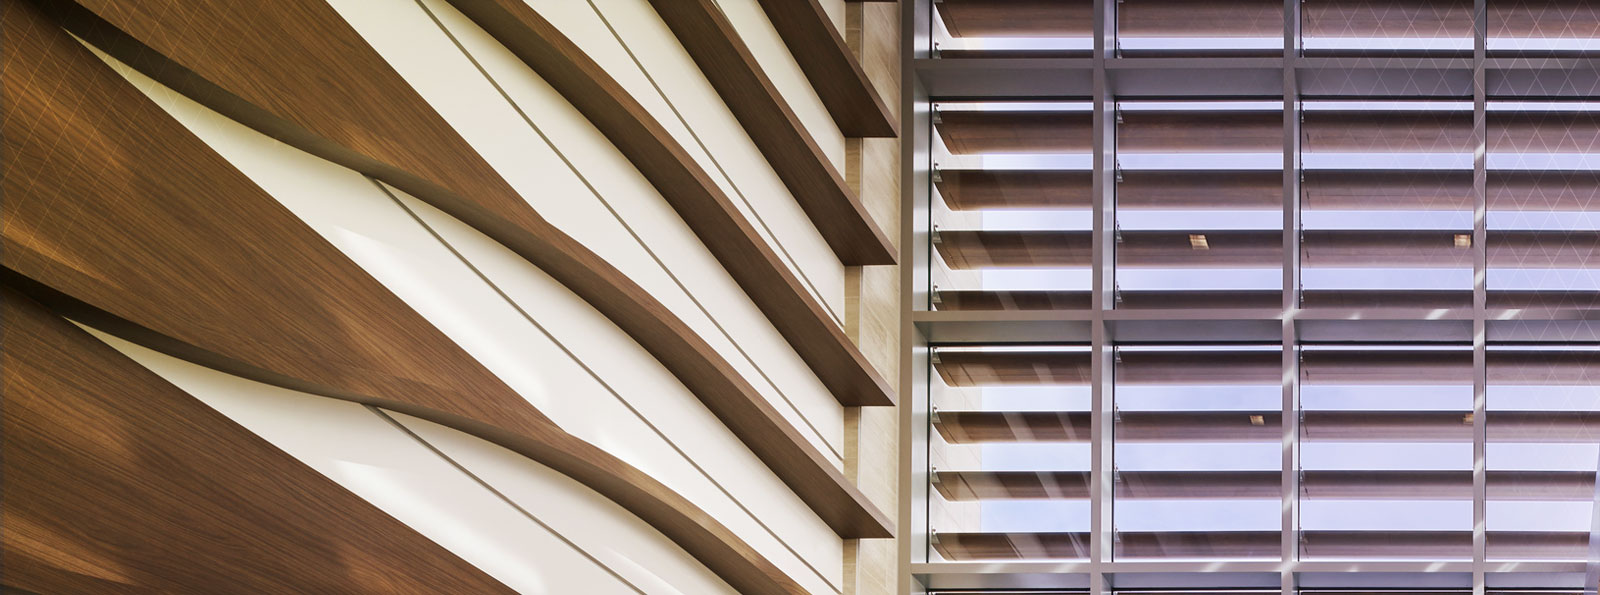 Array Architects' Knowledge Community